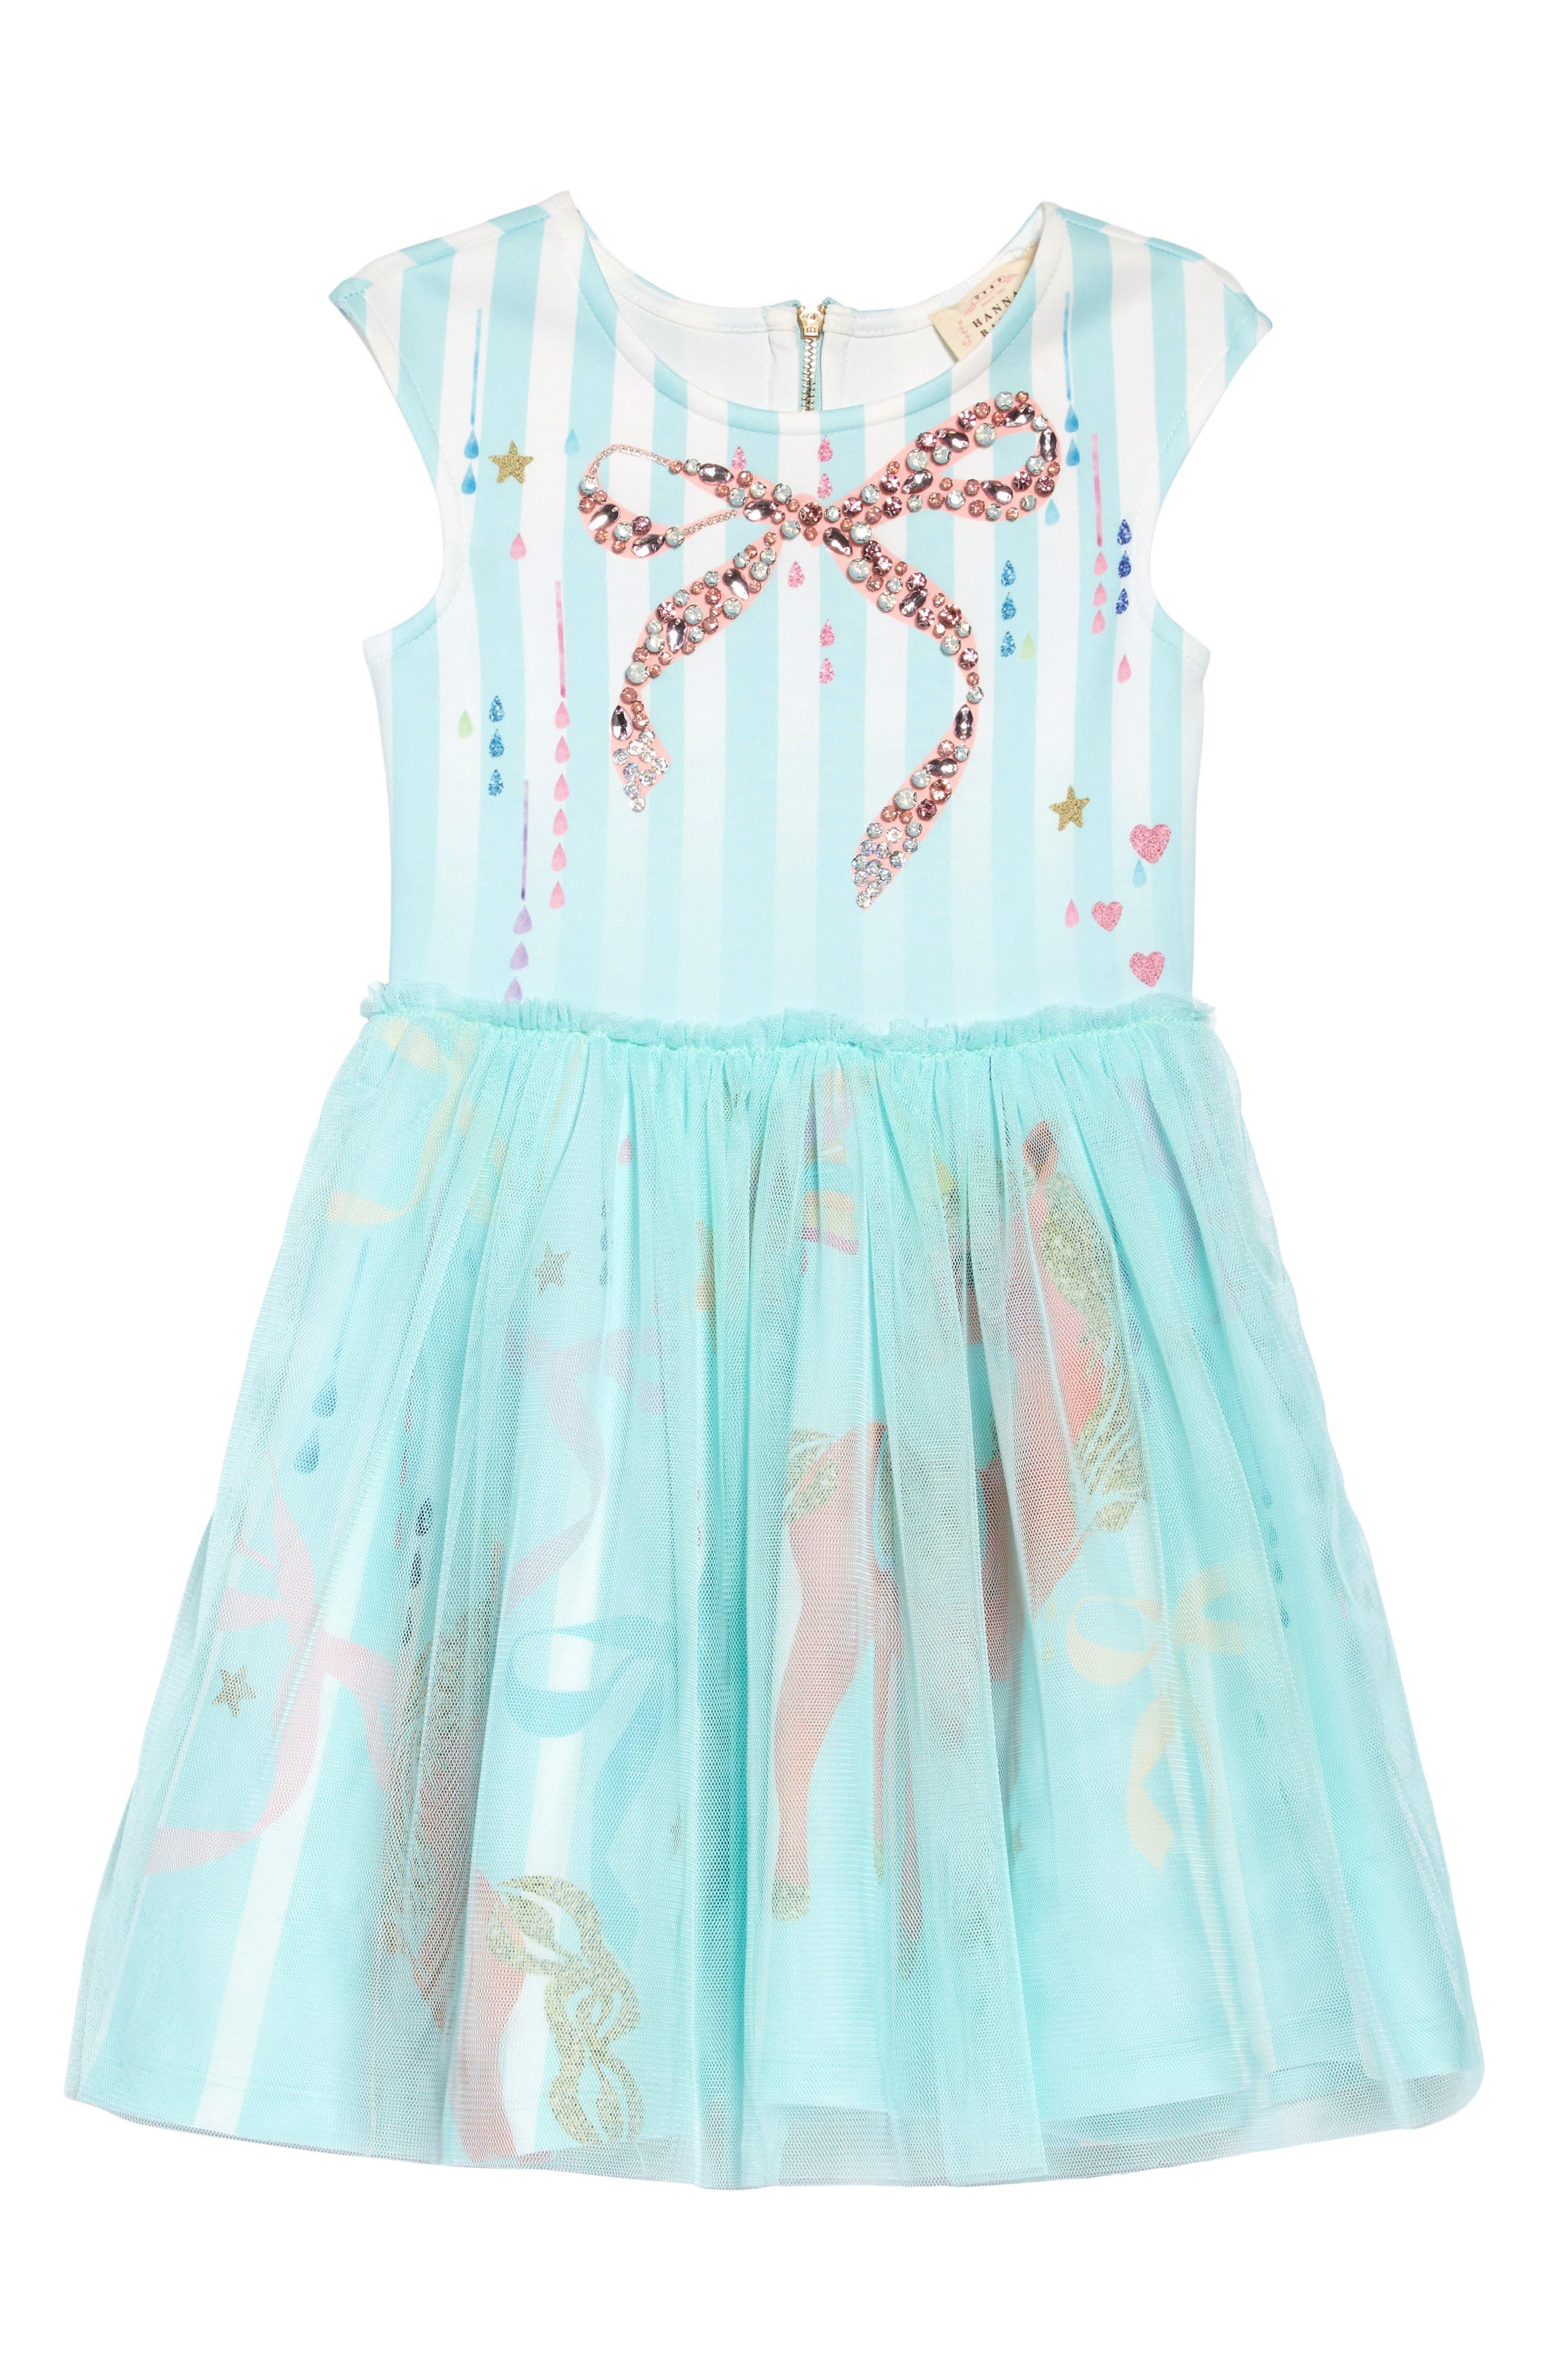 Bow & Unicorn Fit & Flare Tulle Dress, Main, color, MINT MULTI